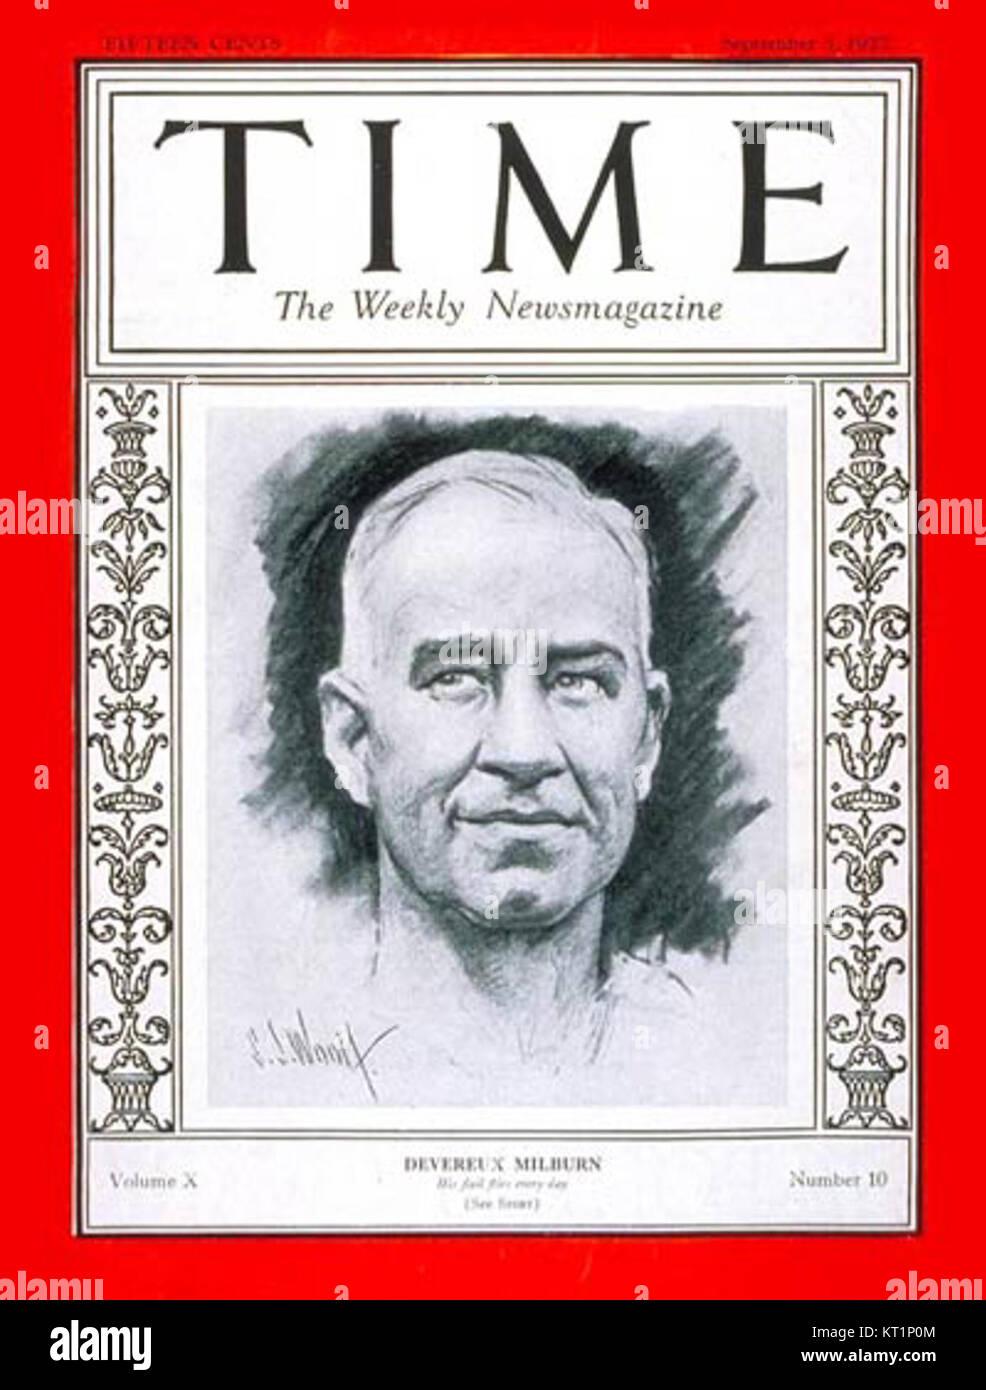 Devereux Milburn on Time Magazine - Stock Image